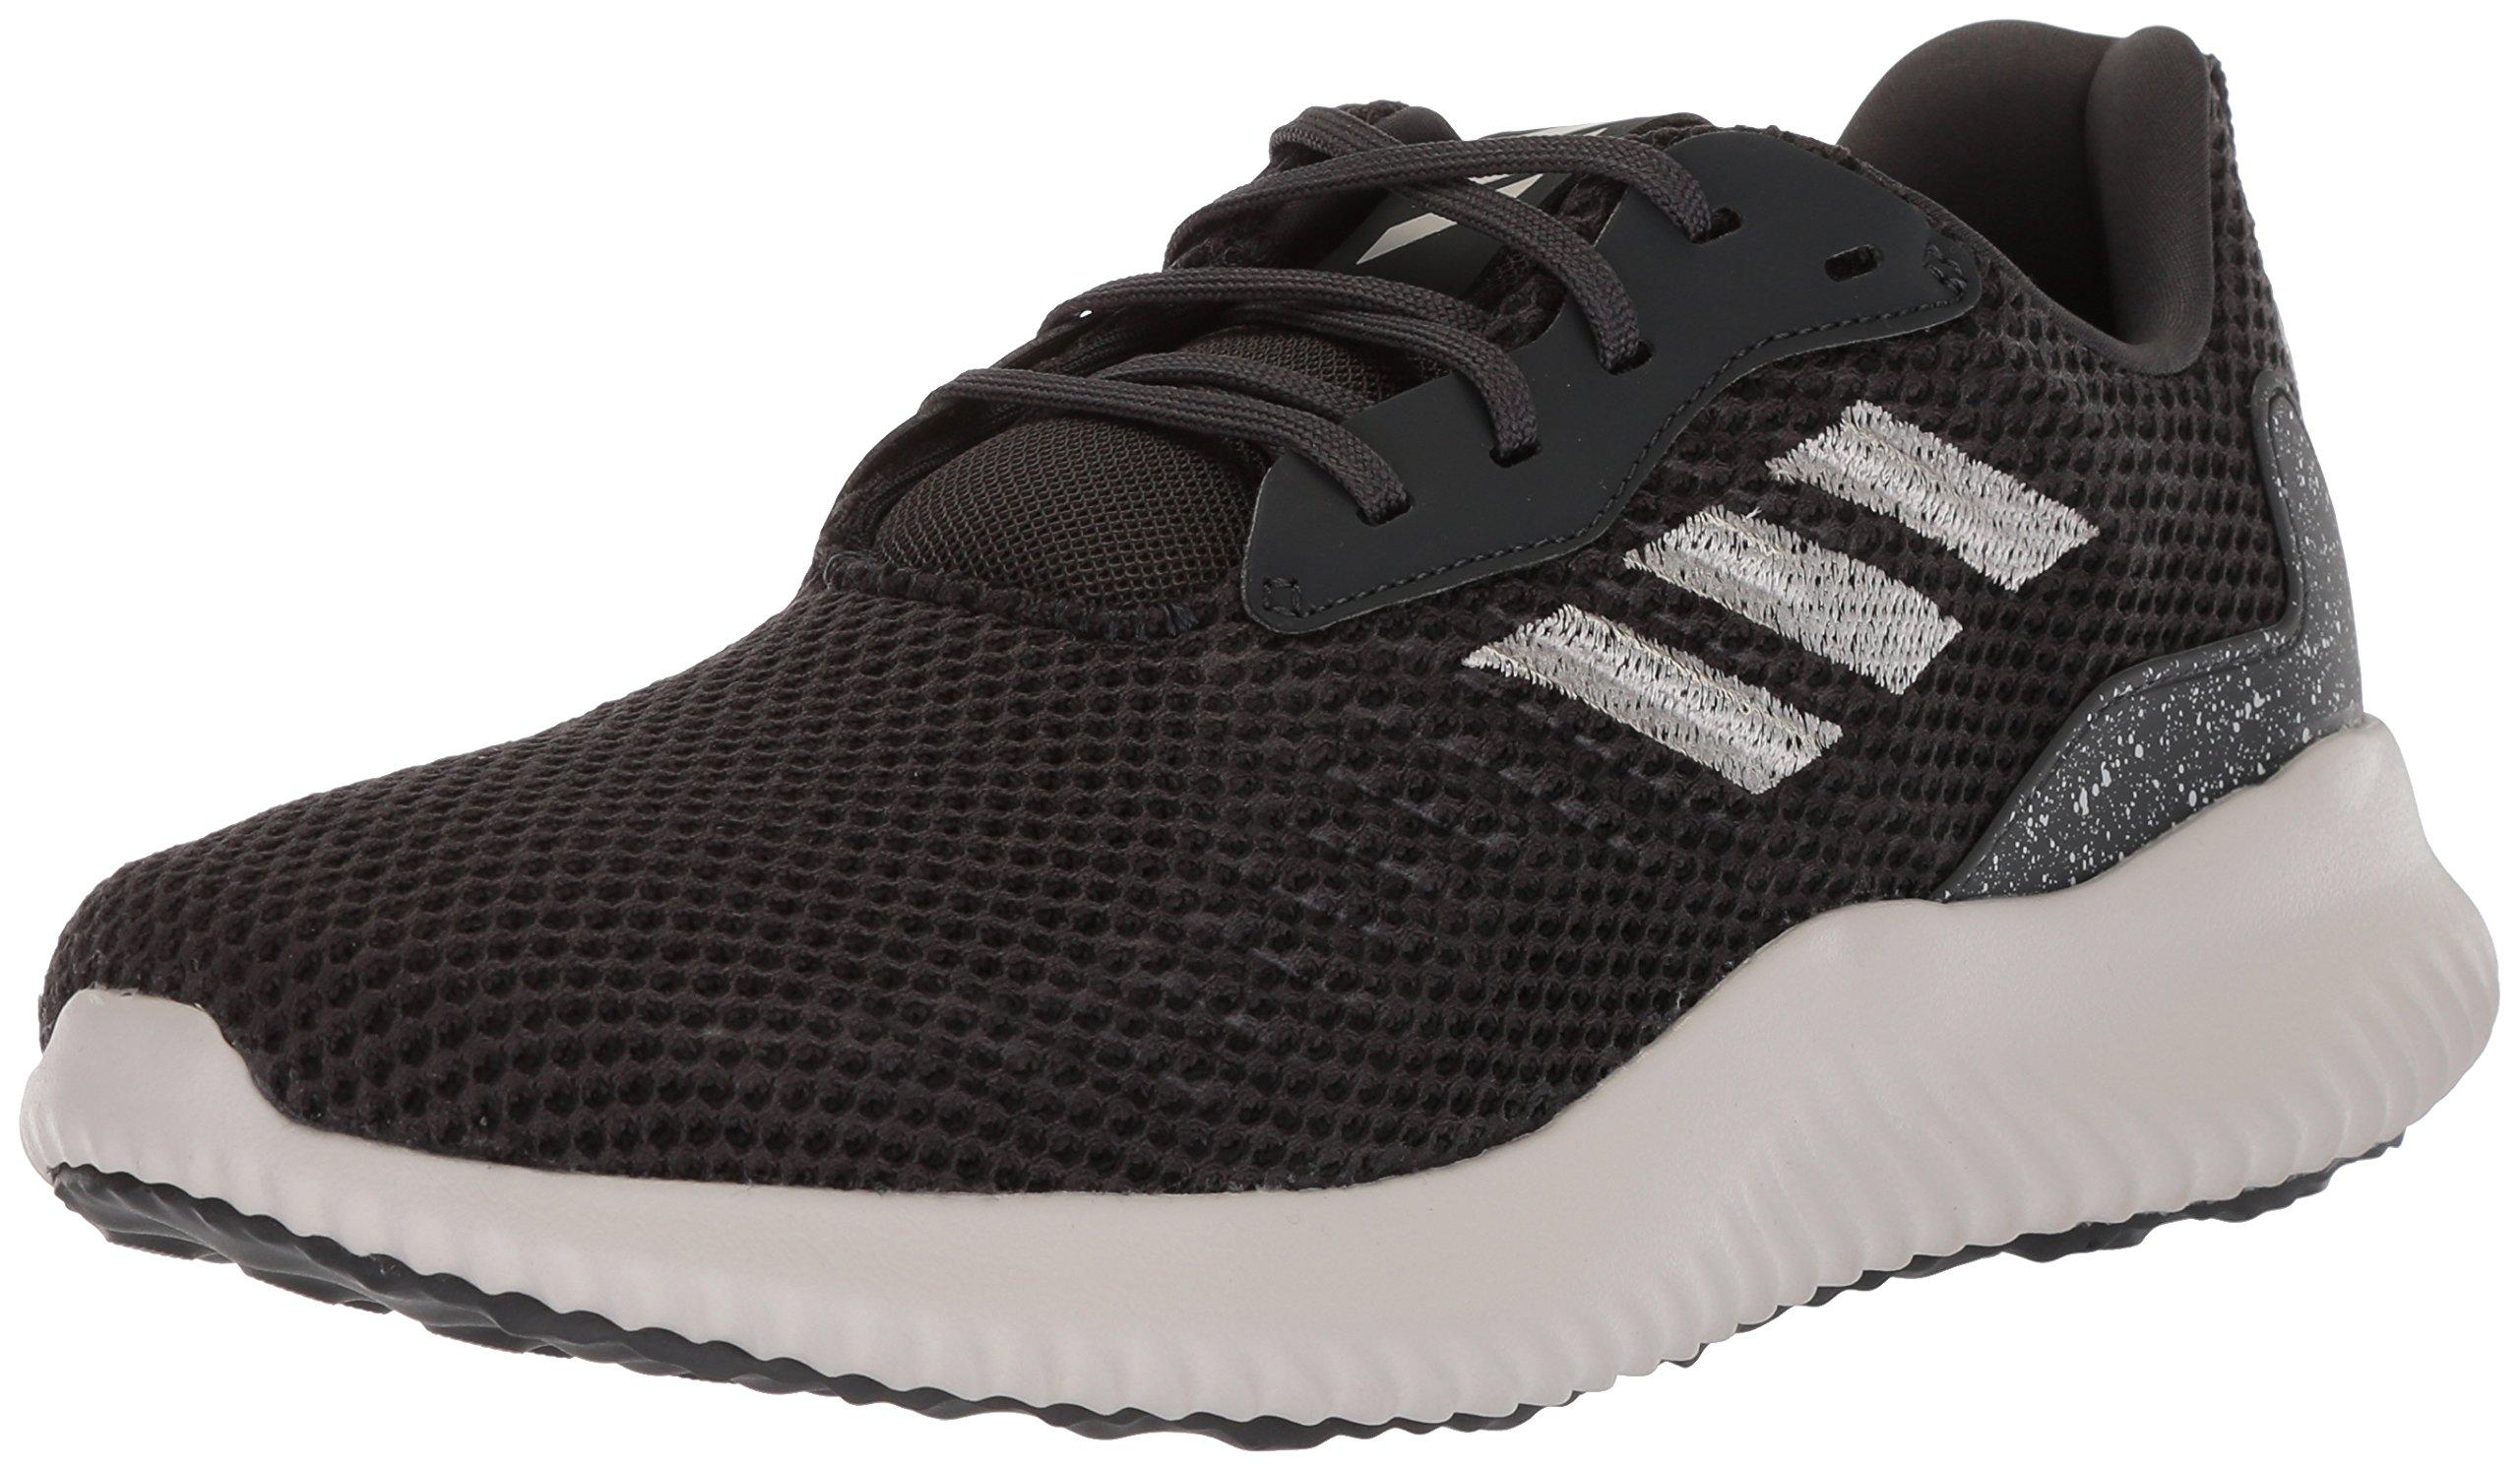 69942fb7c Galleon - Adidas Men s Alphabounce Rc M Running Shoe